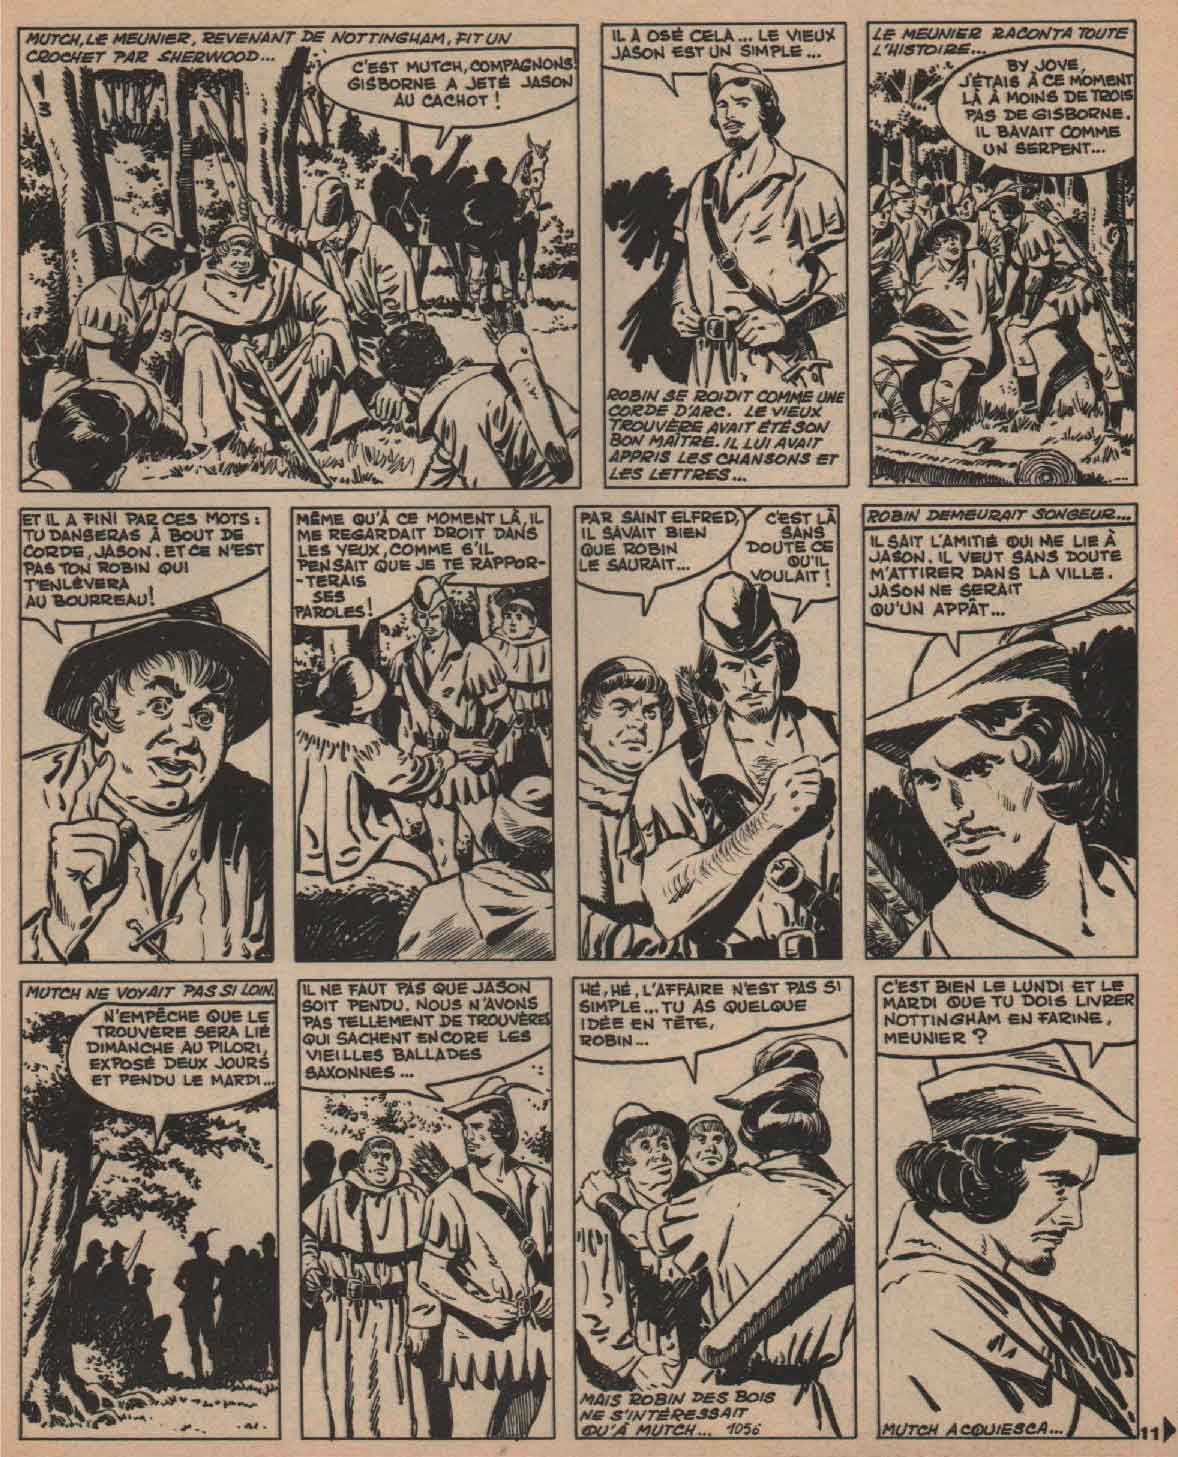 « Robin des bois » Vaillant n° 1056 (08/08/1965).